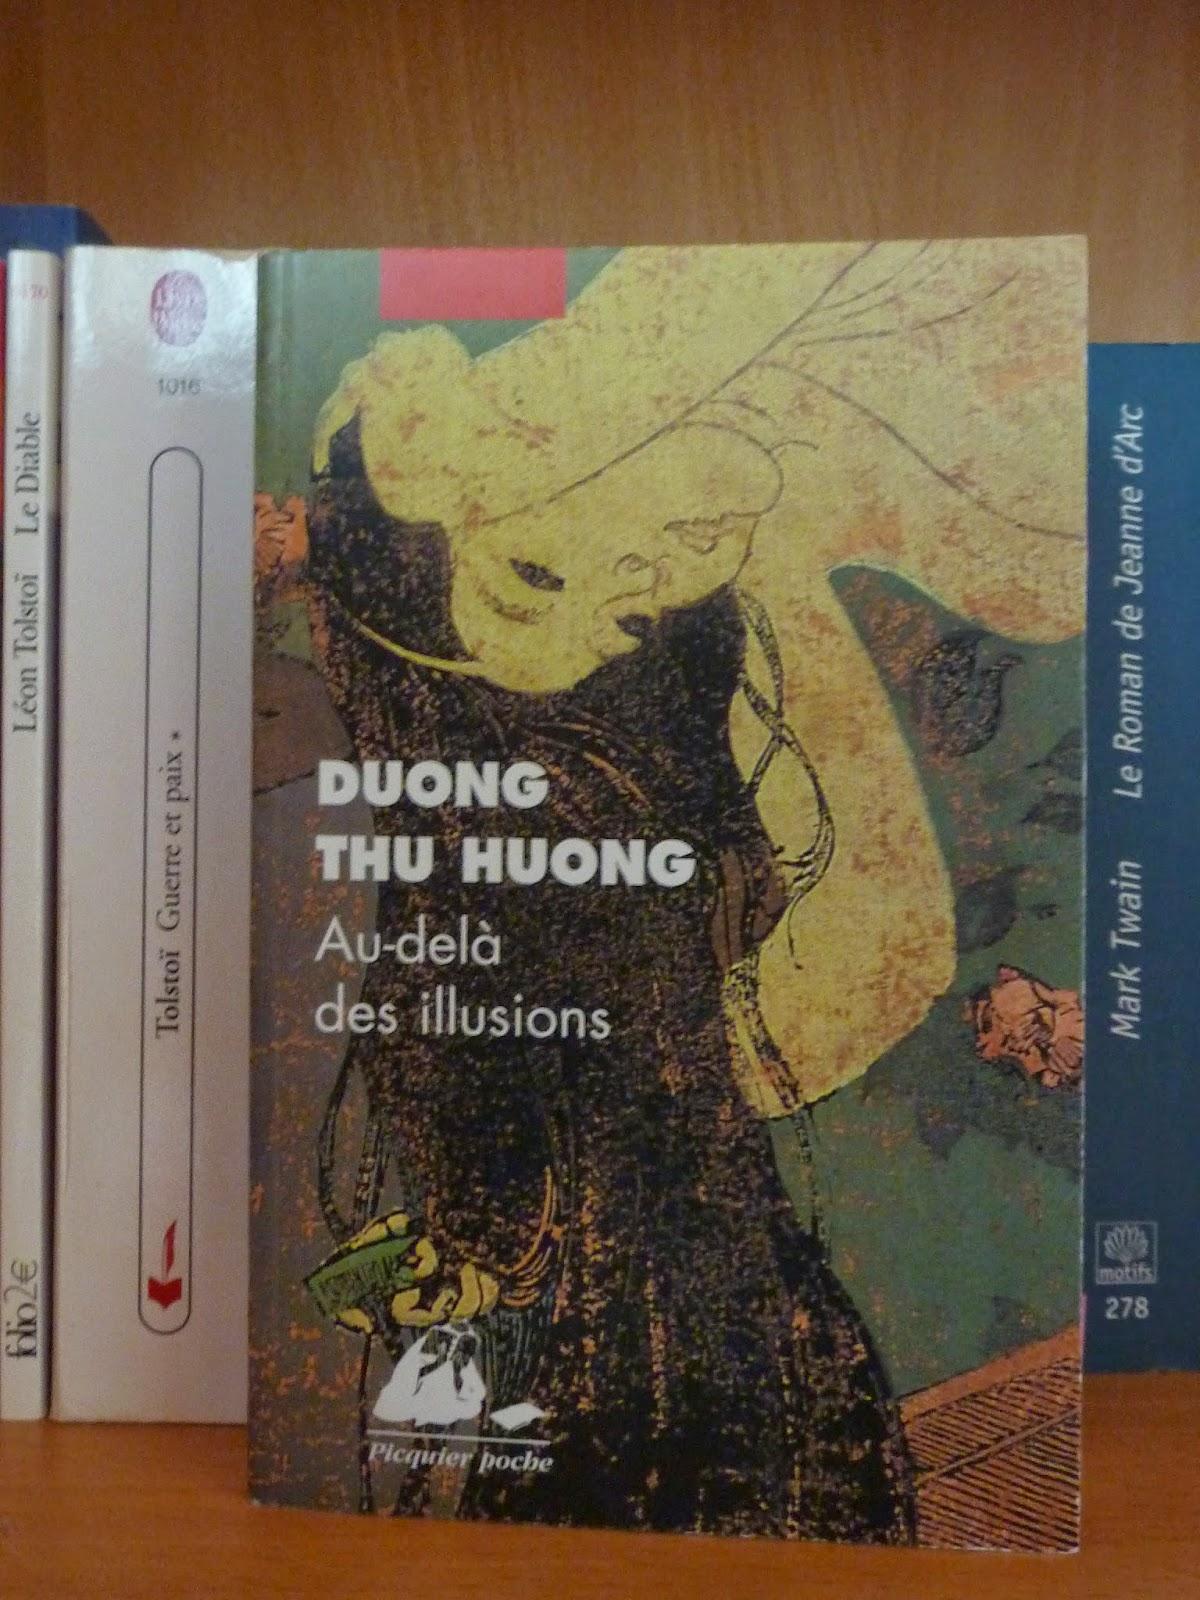 Au-delà des illusions - Duong Thu Huong